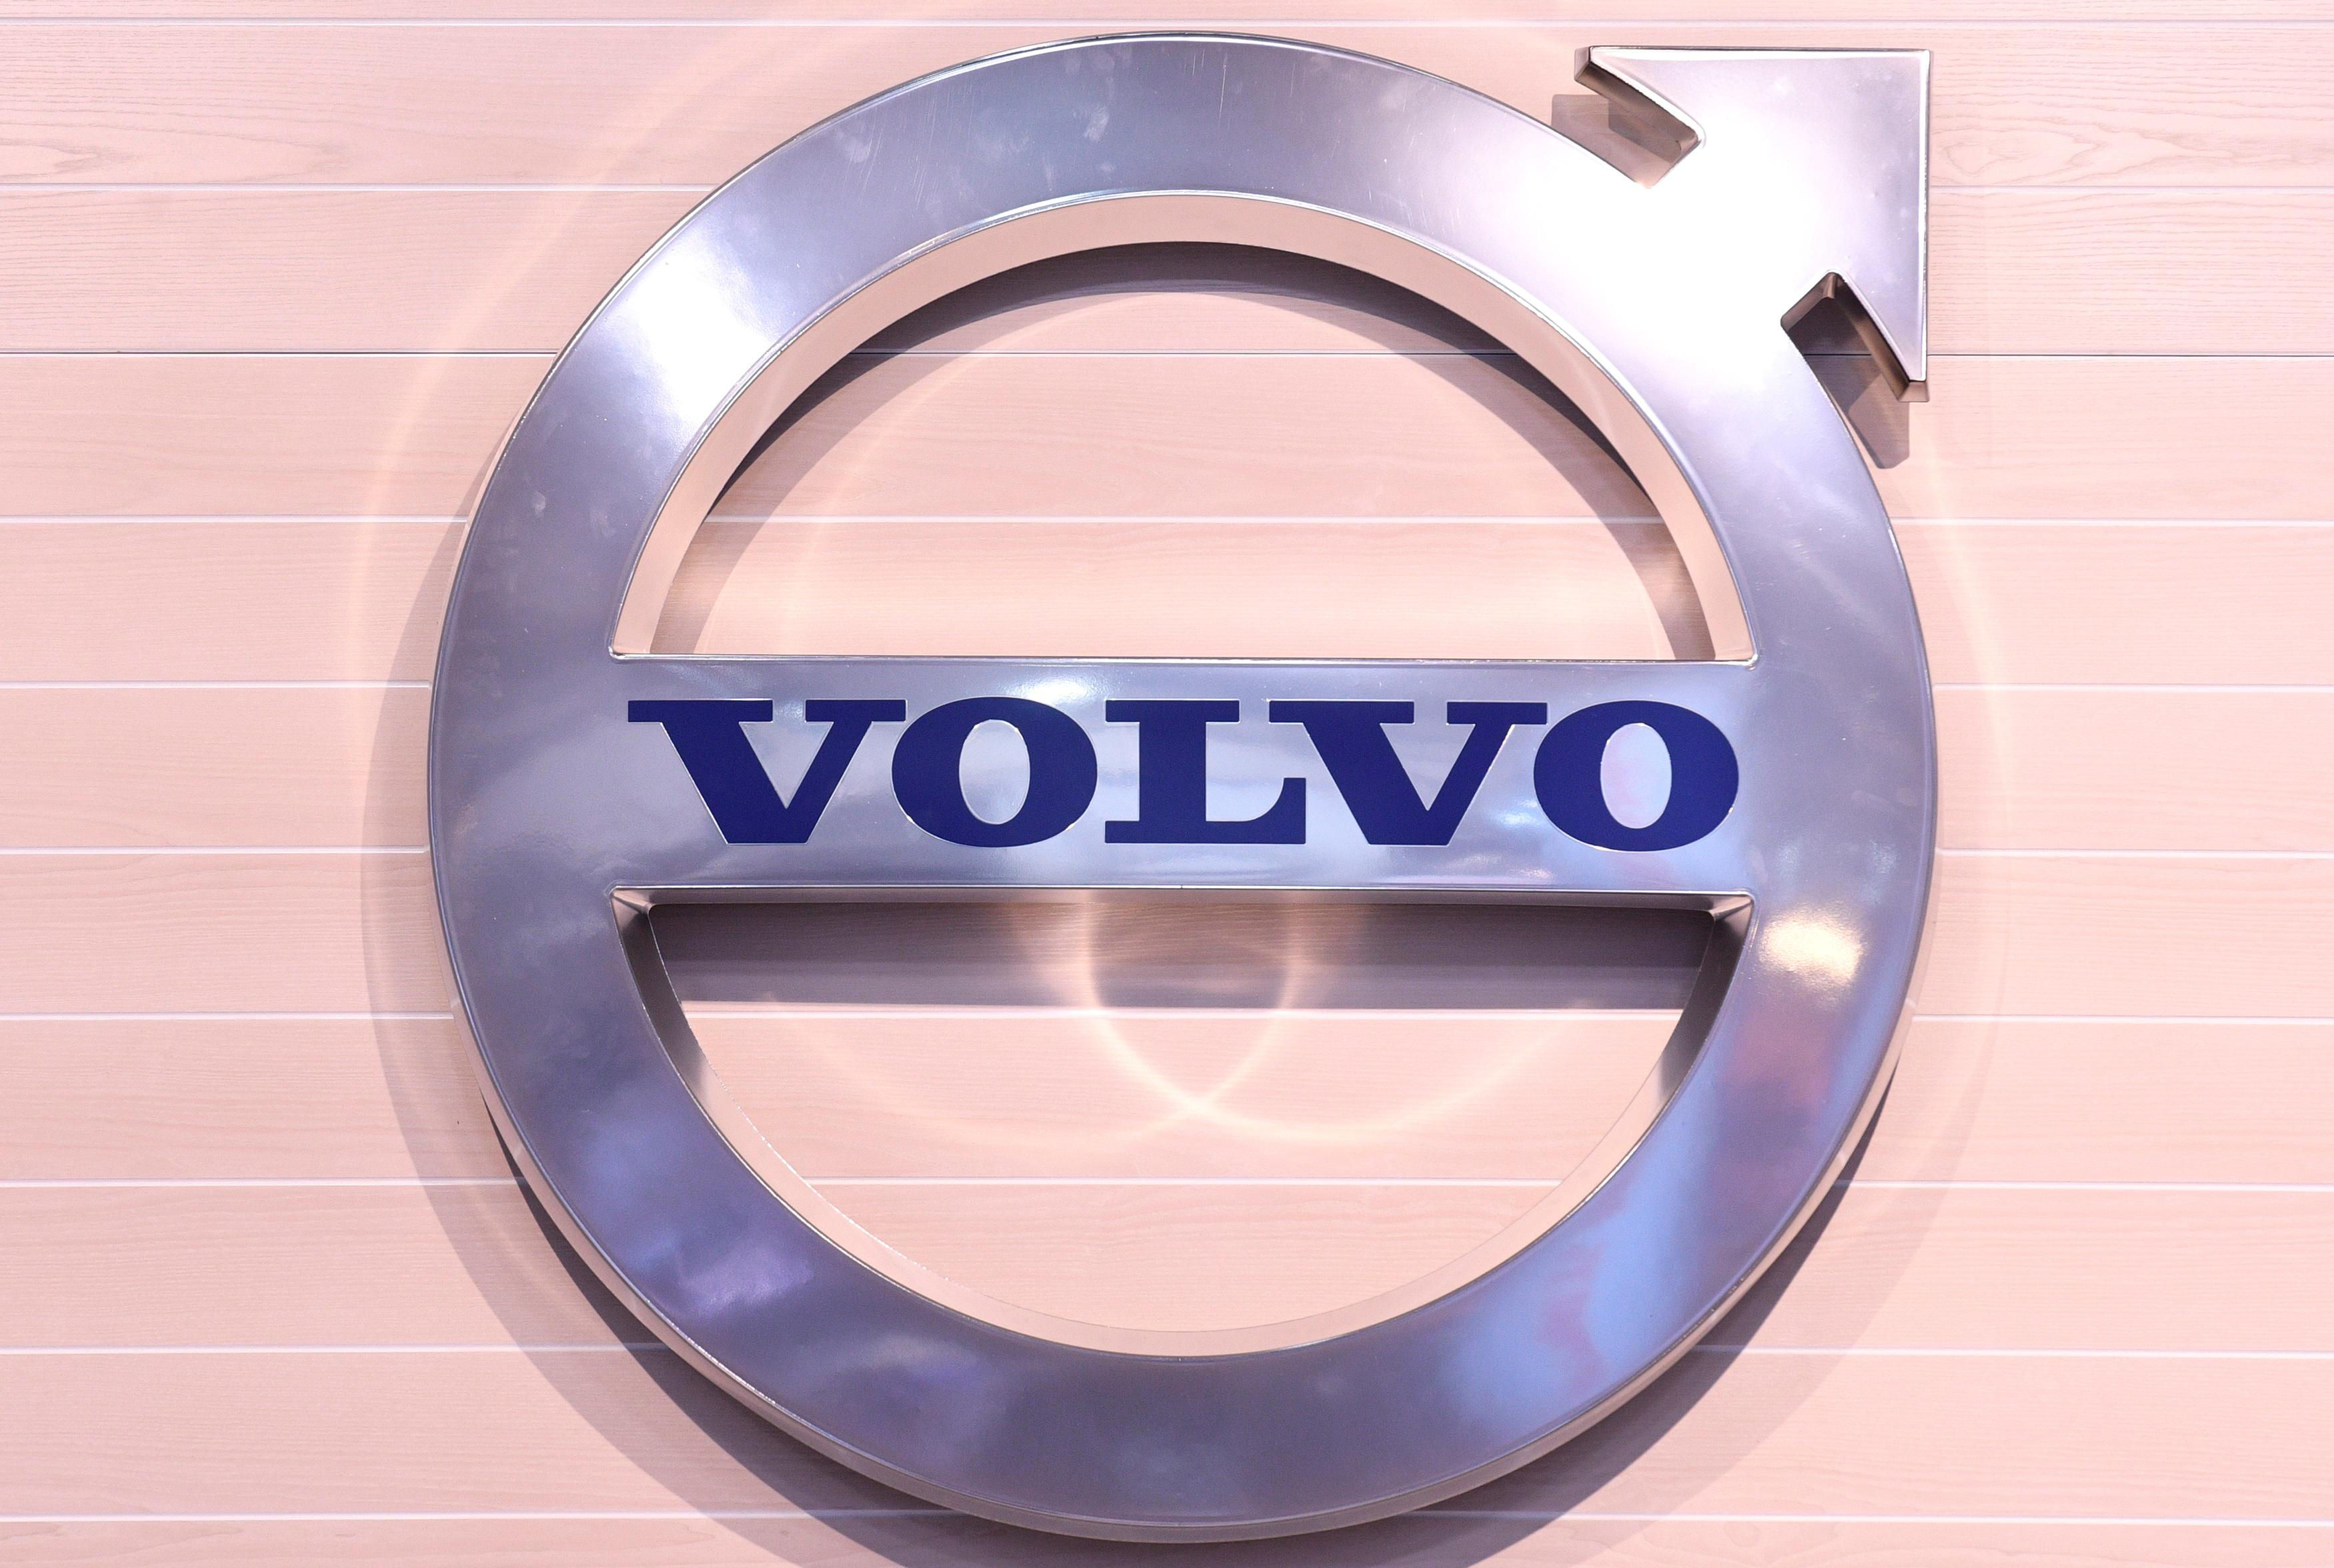 AB Volvo warns of demand slump as truck orders plunge